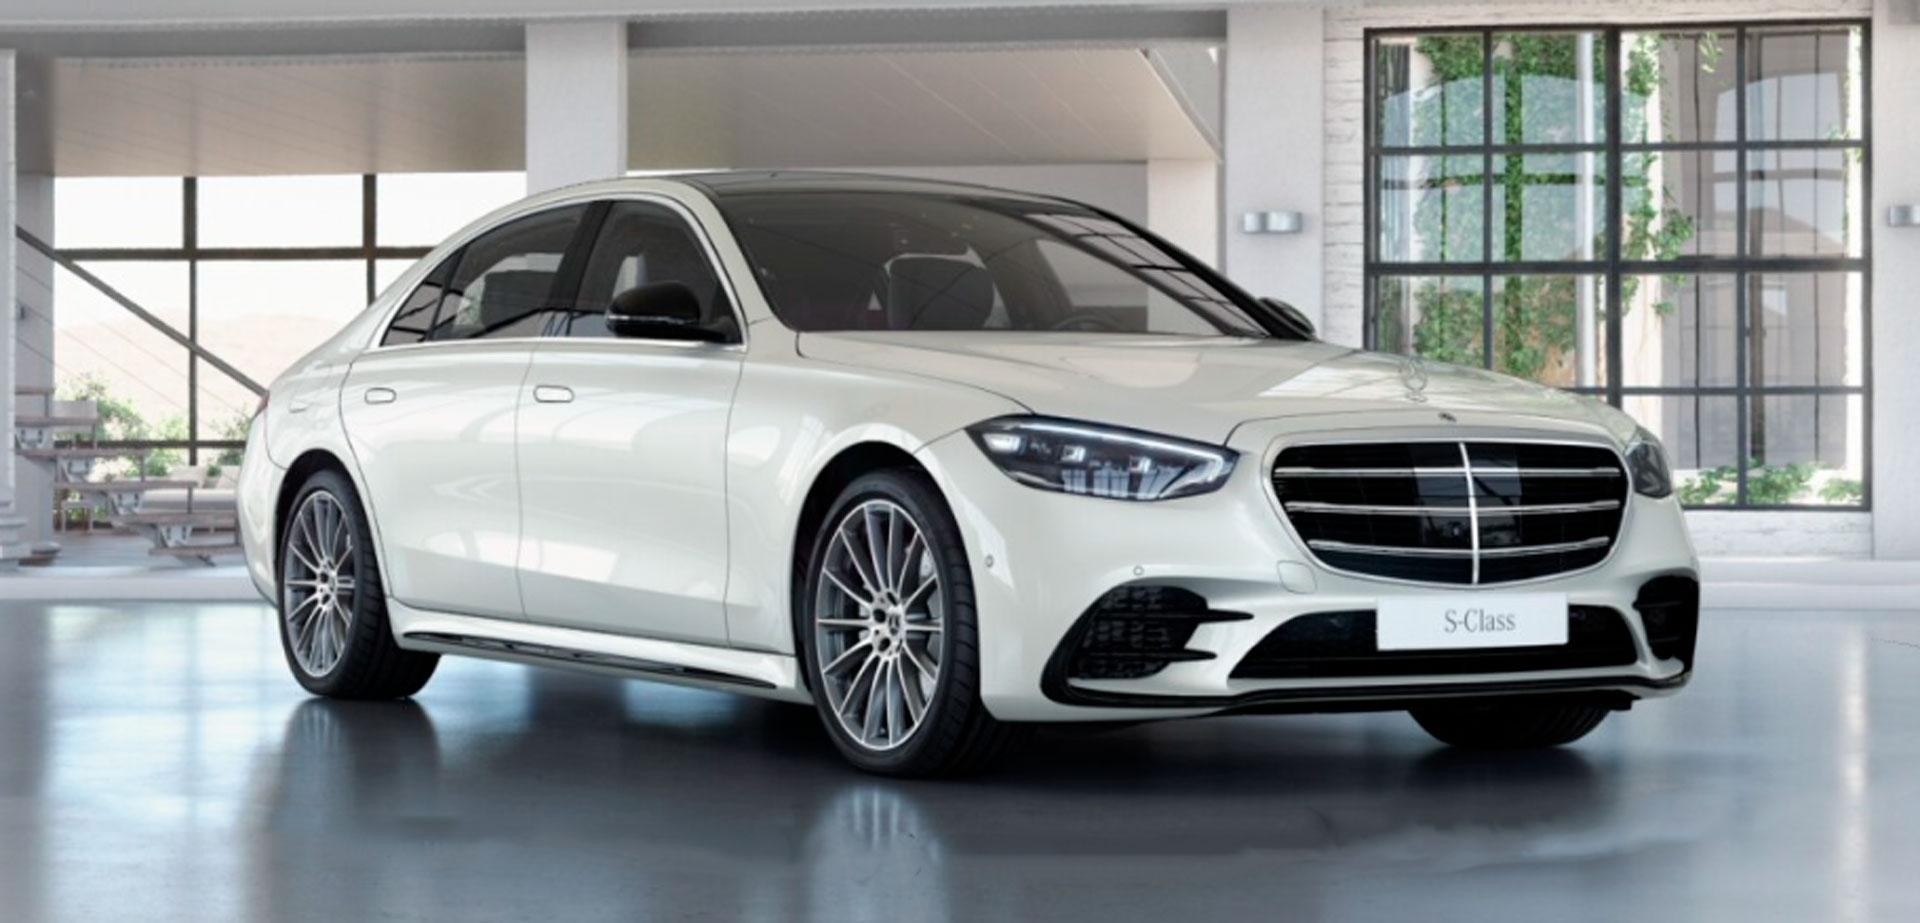 Mercedes-Benz S-Class Limousine 0152623175